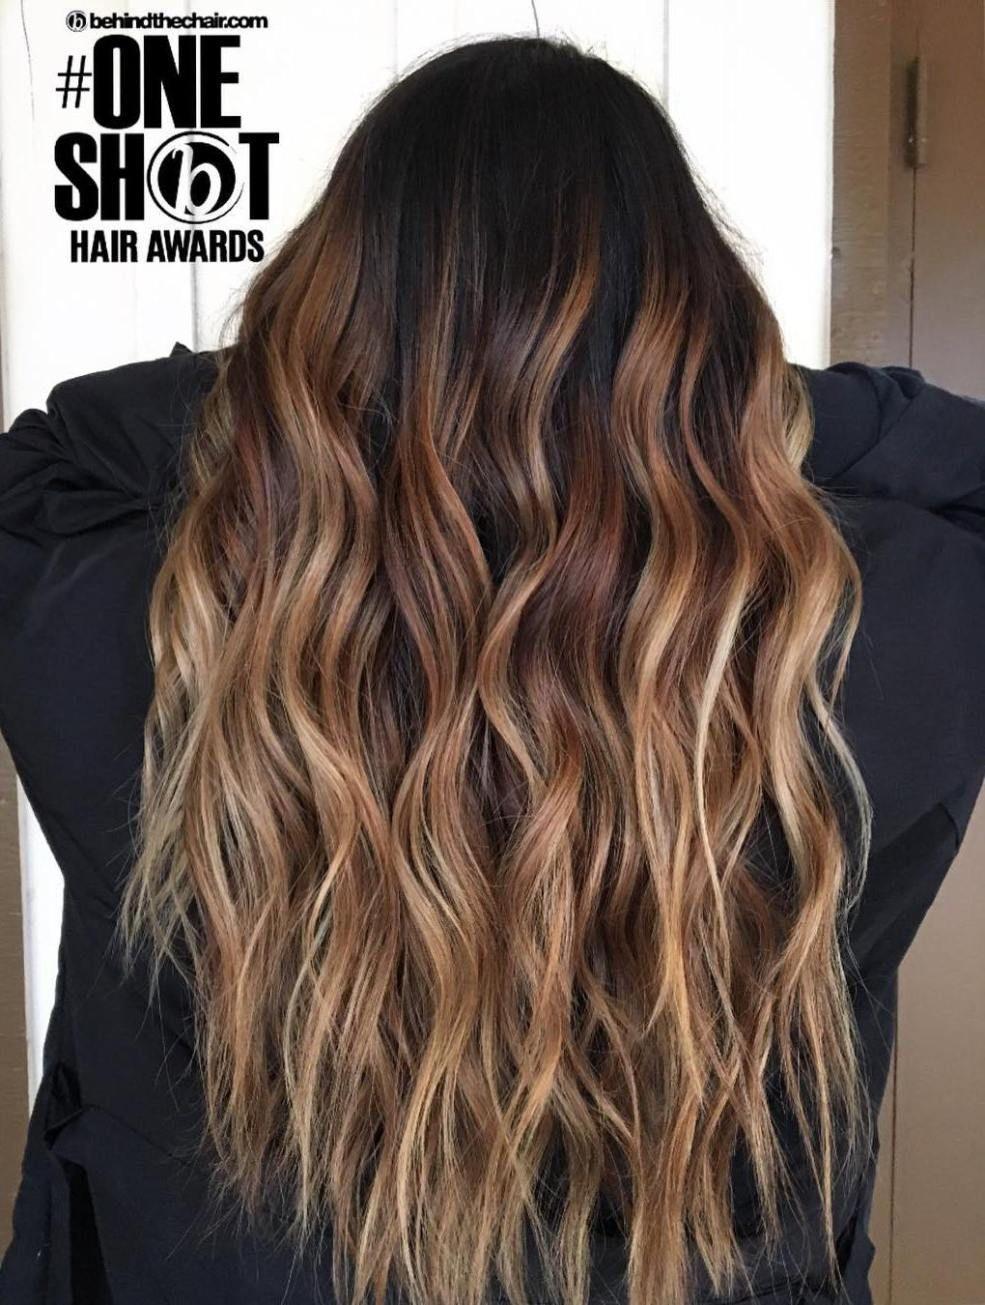 60 Looks With Caramel Highlights On Brown And Dark Brown Hair Caramel Blonde Hair Black Hair Ombre Hair Color Caramel